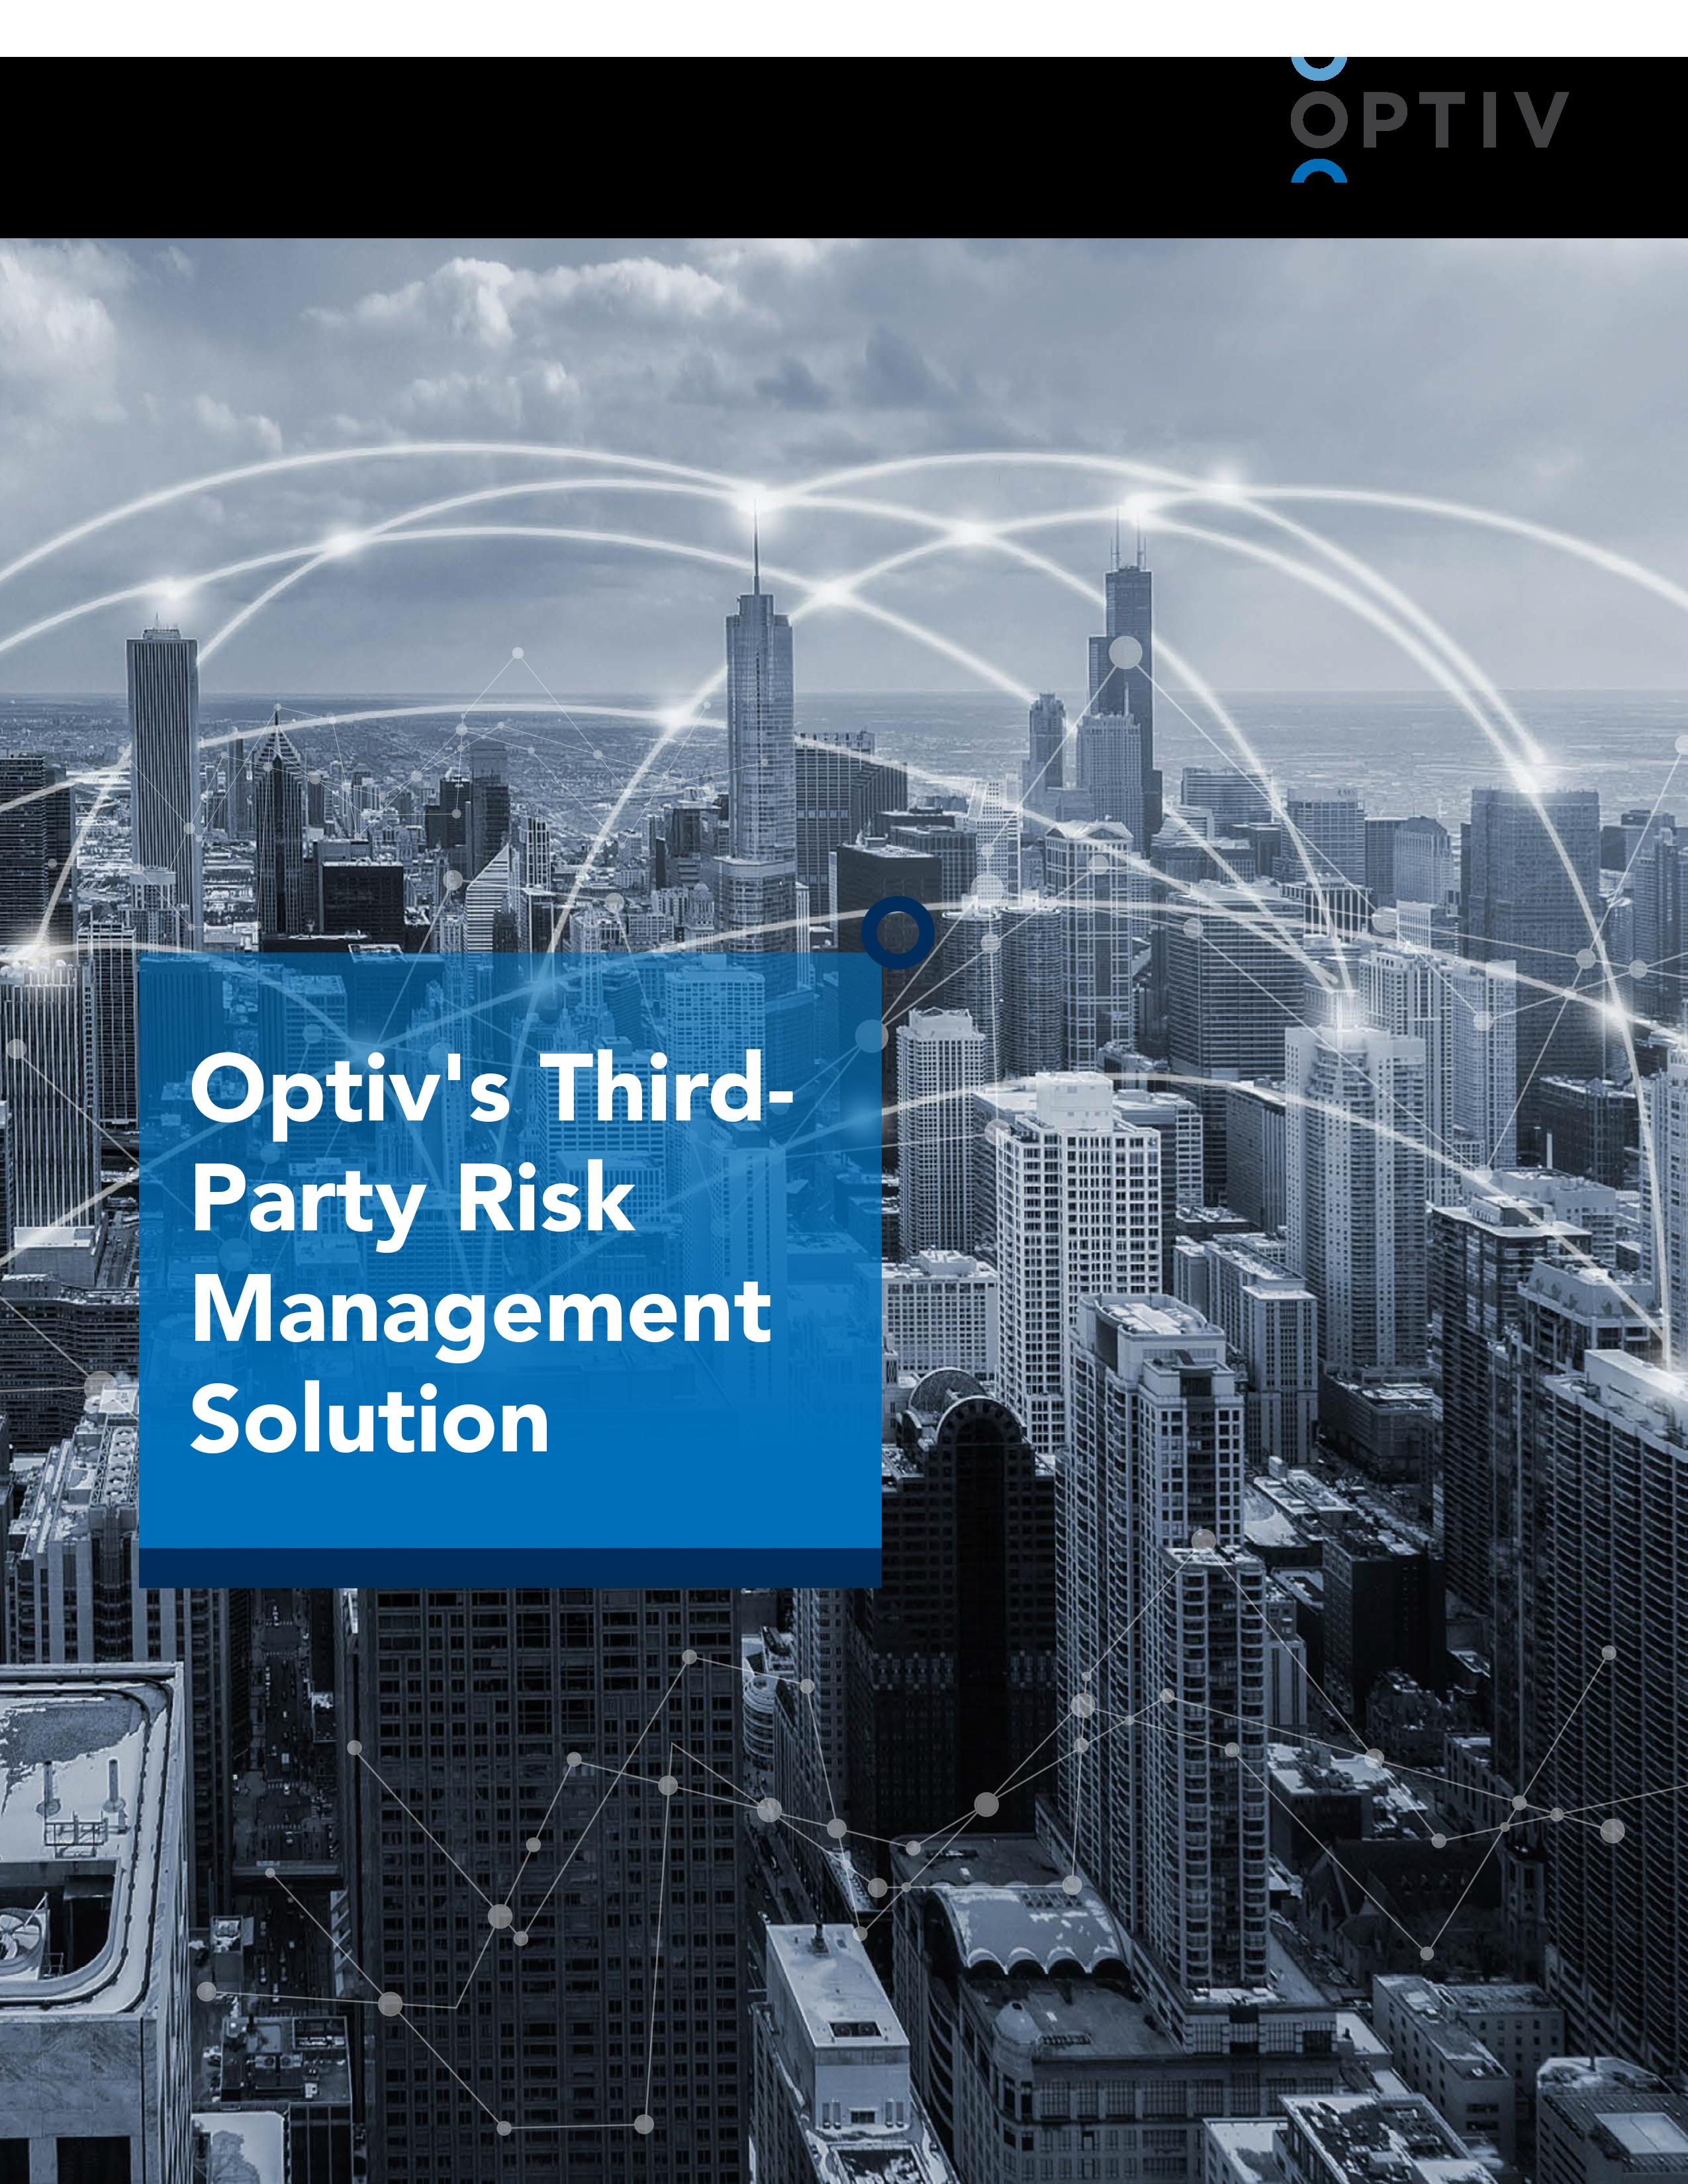 Optiv's Third-Party Risk Management Solution